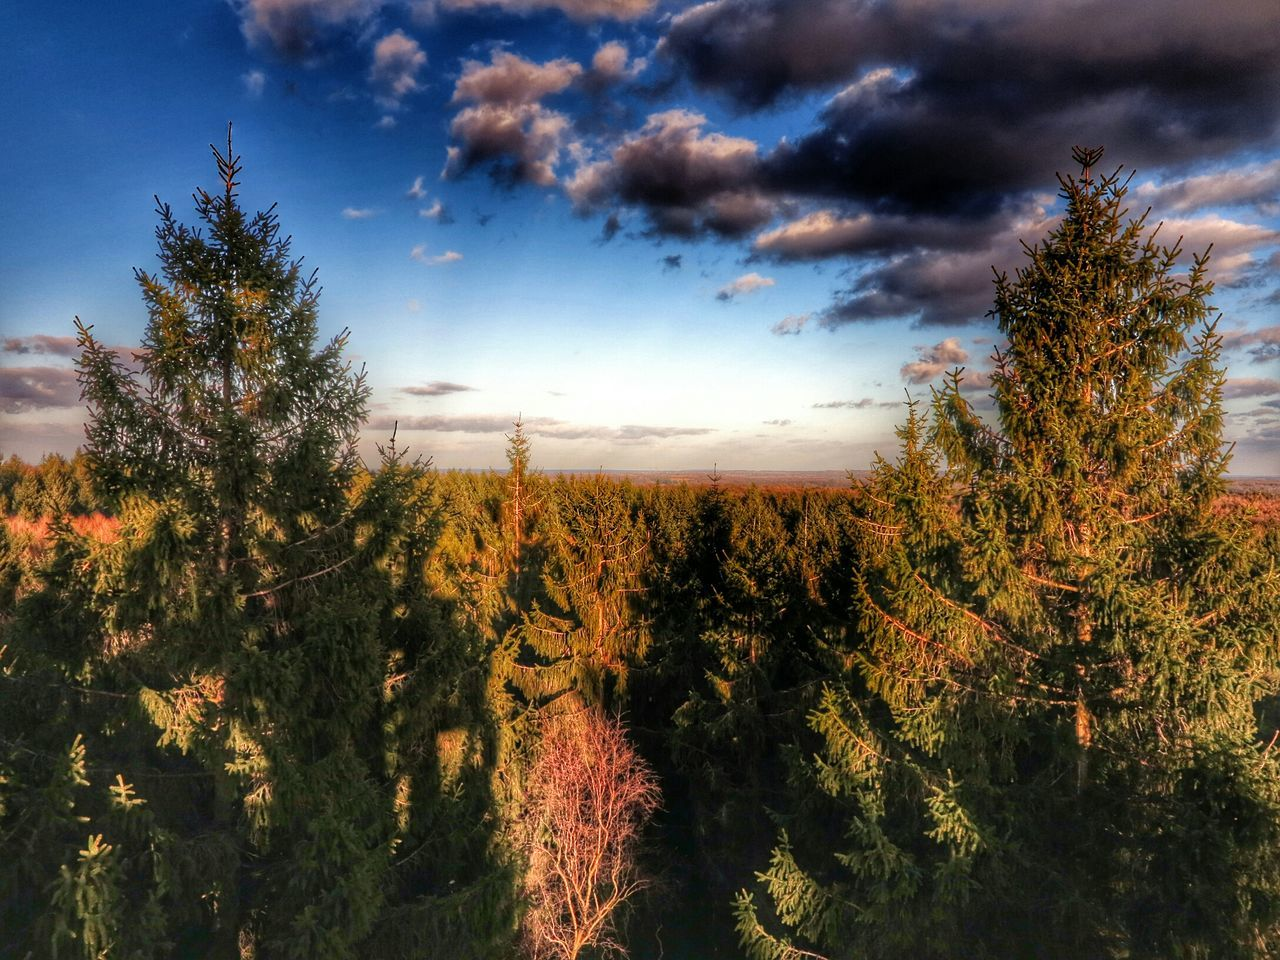 Stormarn Forrest Wald Schleswig-Holstein Natur Nature EyeEm Nature Lover HDR